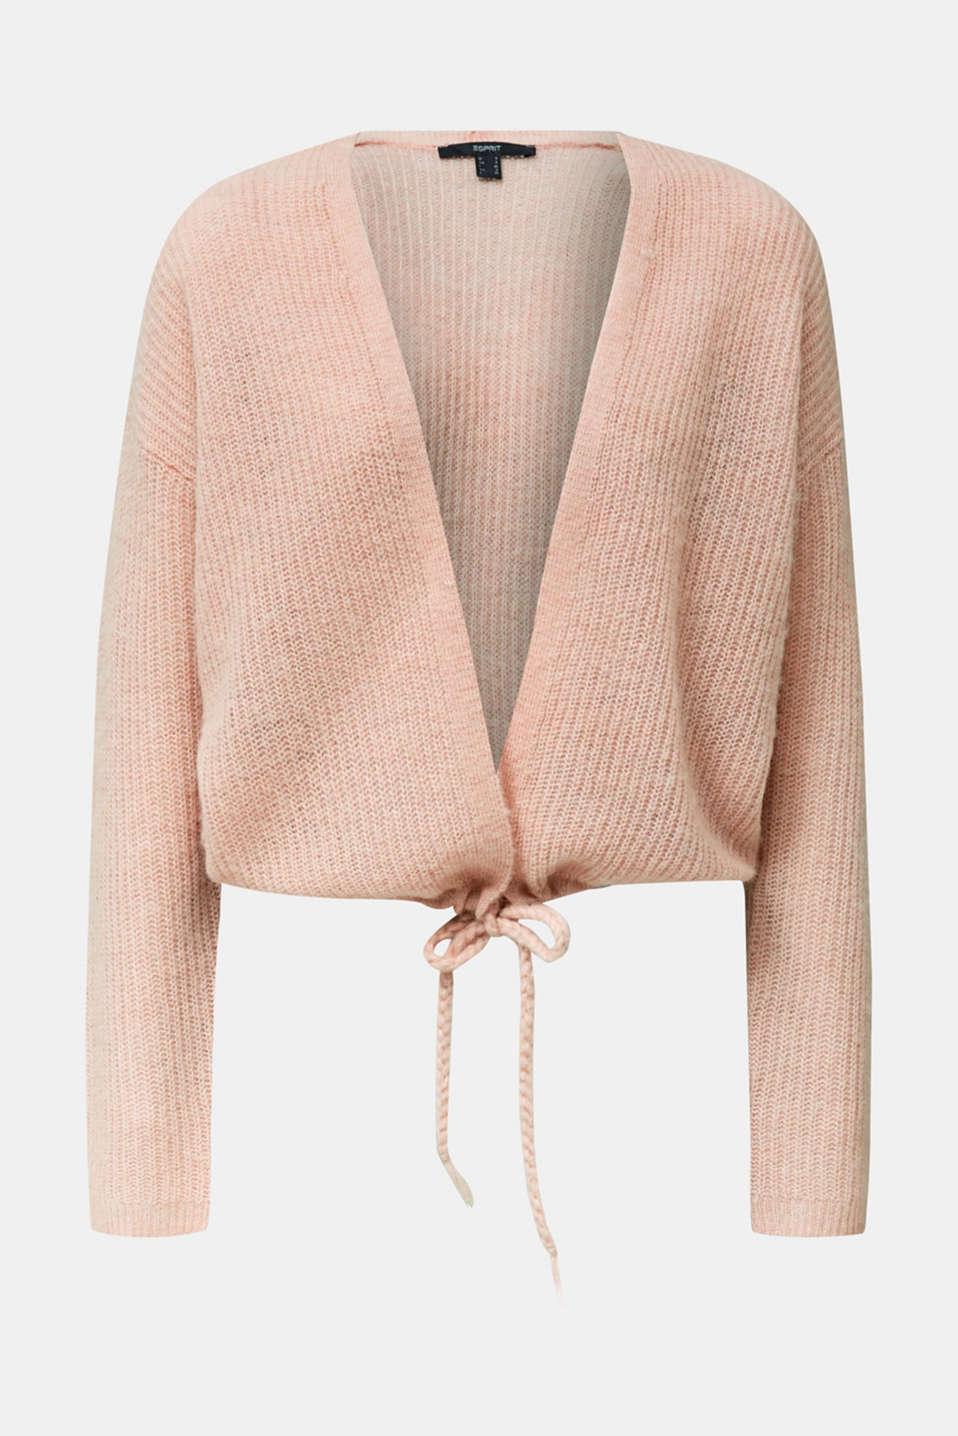 With wool/alpaca: premium cardigan, NUDE, detail image number 7